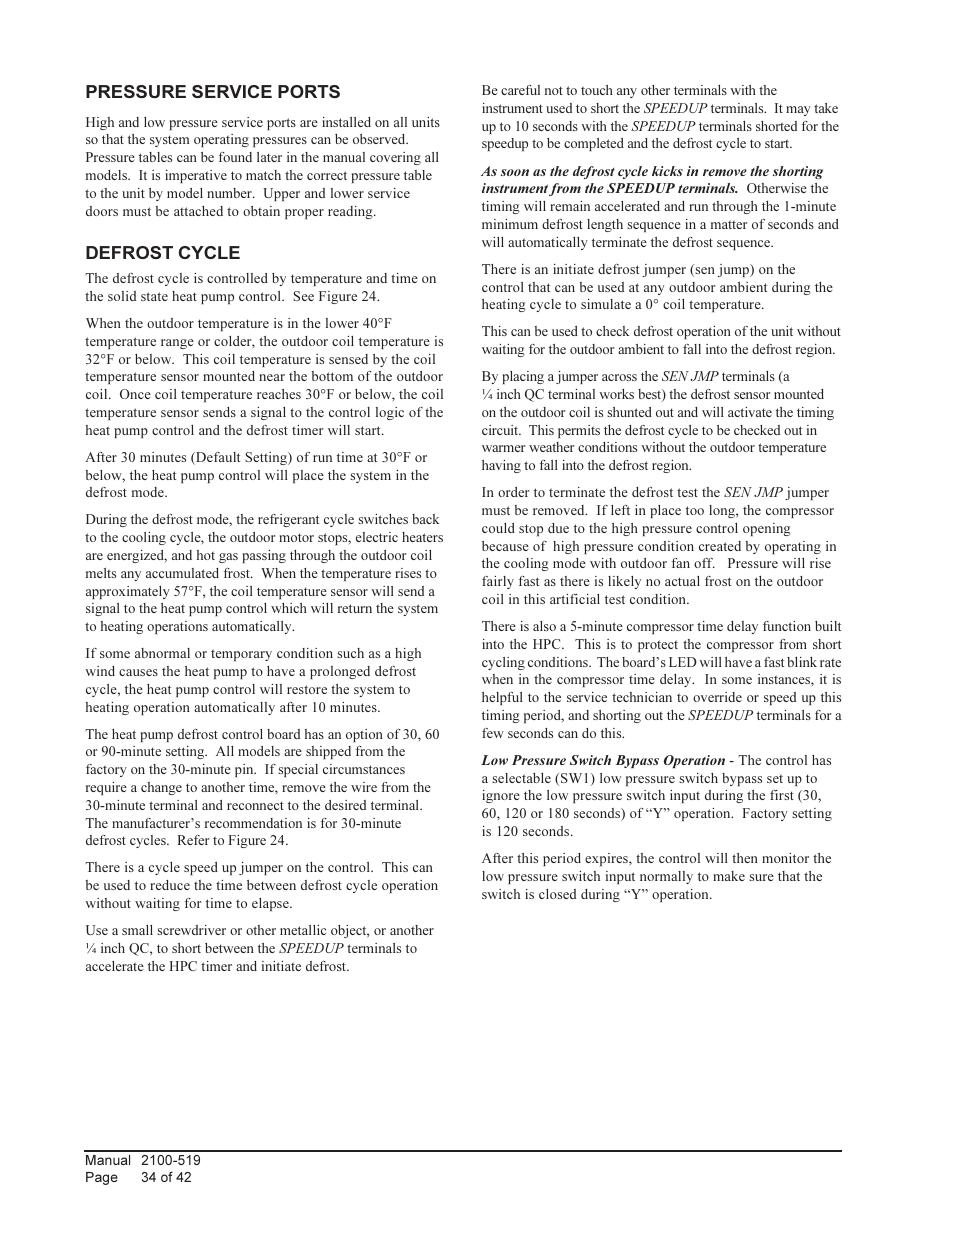 Bard QTEC SERIES PACKAGED HEAT PUMP Q30H1 User Manual | Page